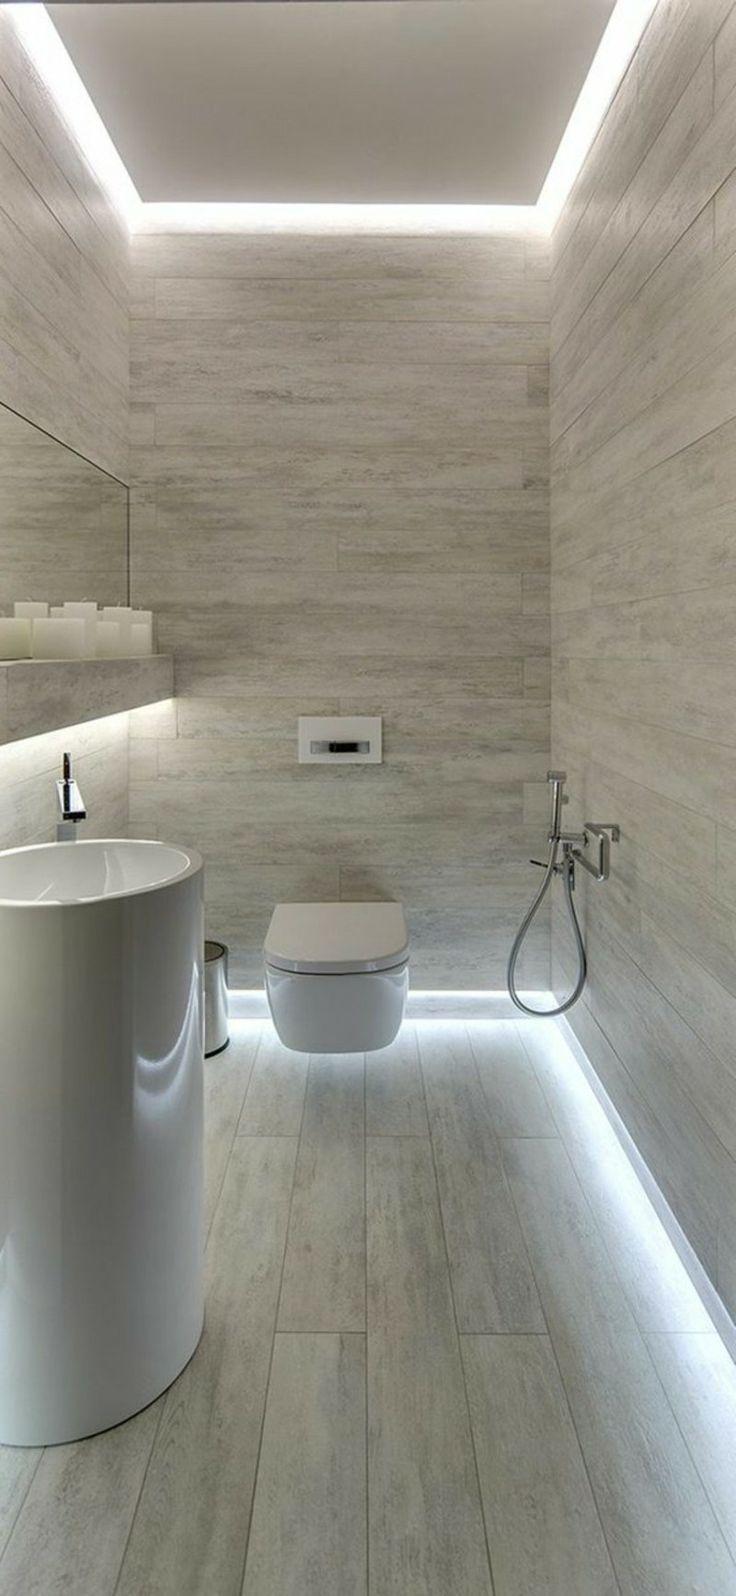 Angenehme Atmosphare Mit Indirekter Beleuchtung Led Beleuchtung Angenehm Angenehm An Modern Bathroom Design Modern Bathroom Bathroom Ceiling Light